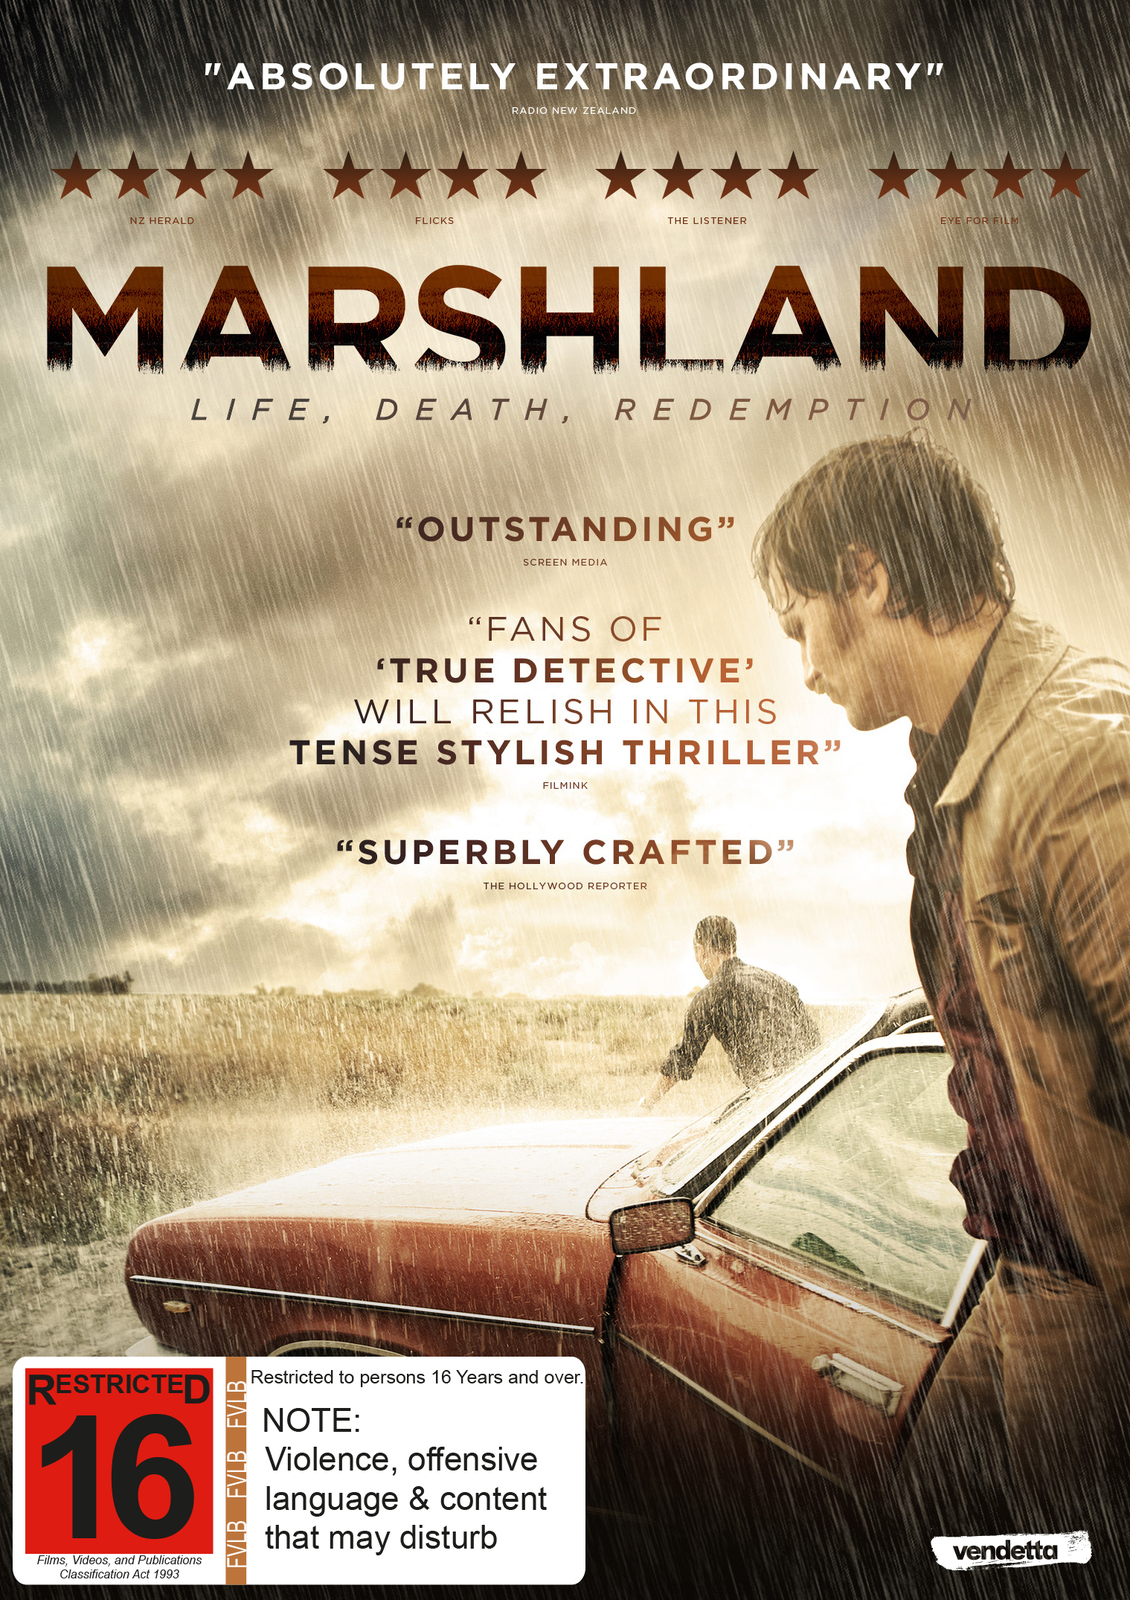 Marshland DVD image